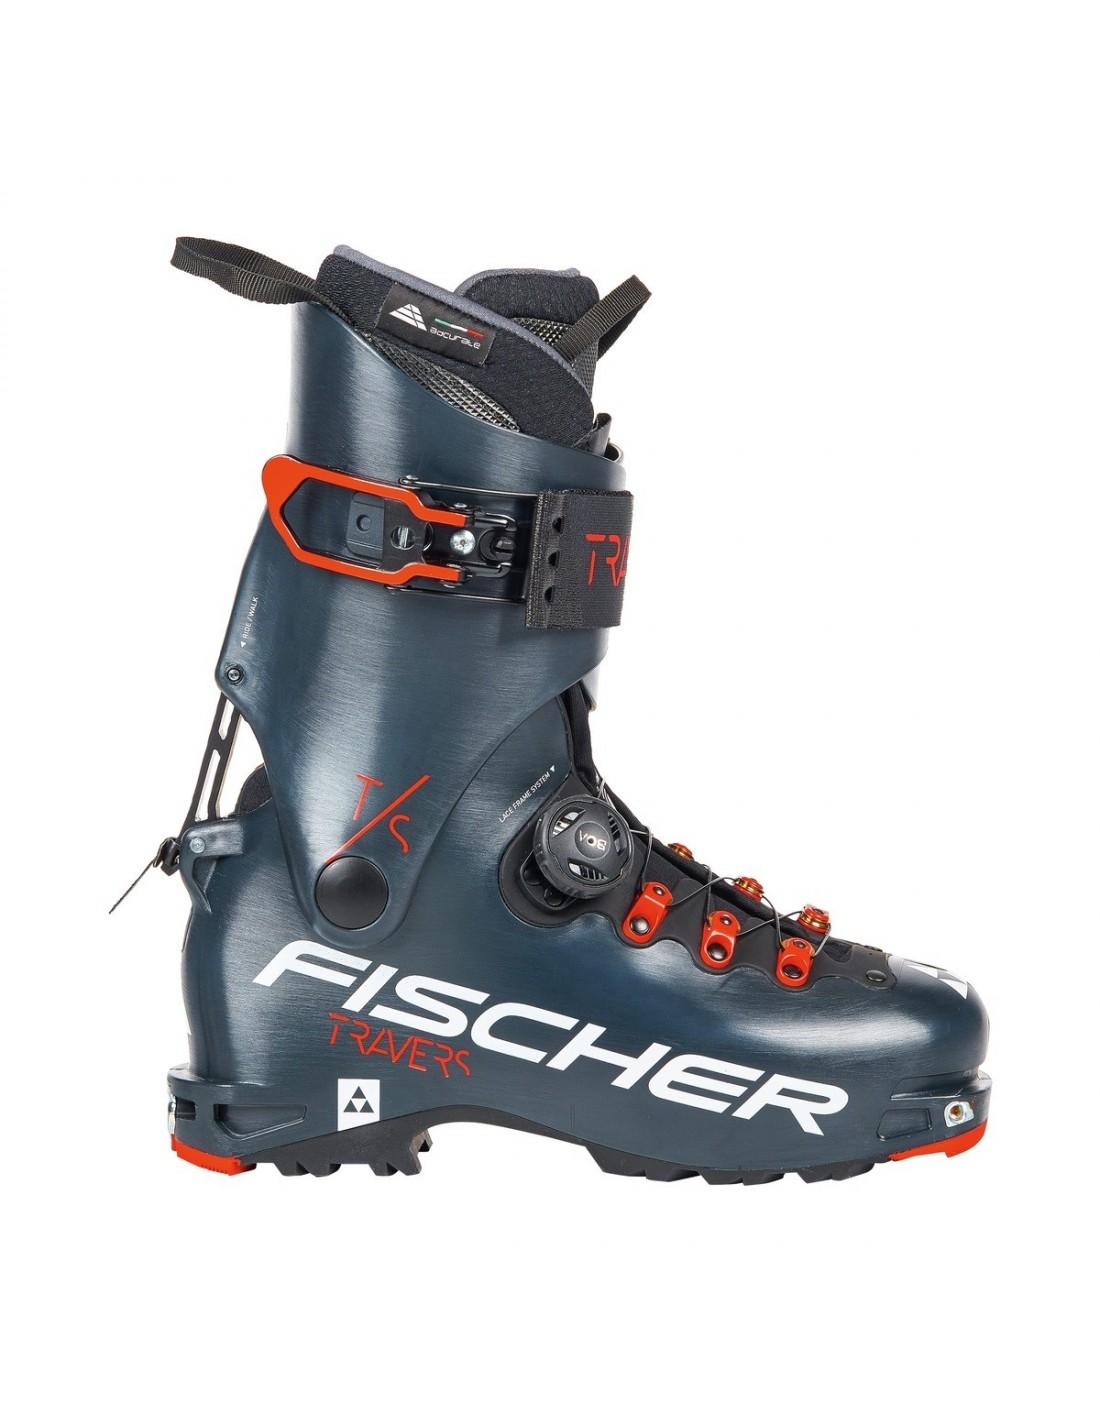 Alpinstøvler Voksen Fischer Travers TS Randoneestøvel U18619 5,999.00